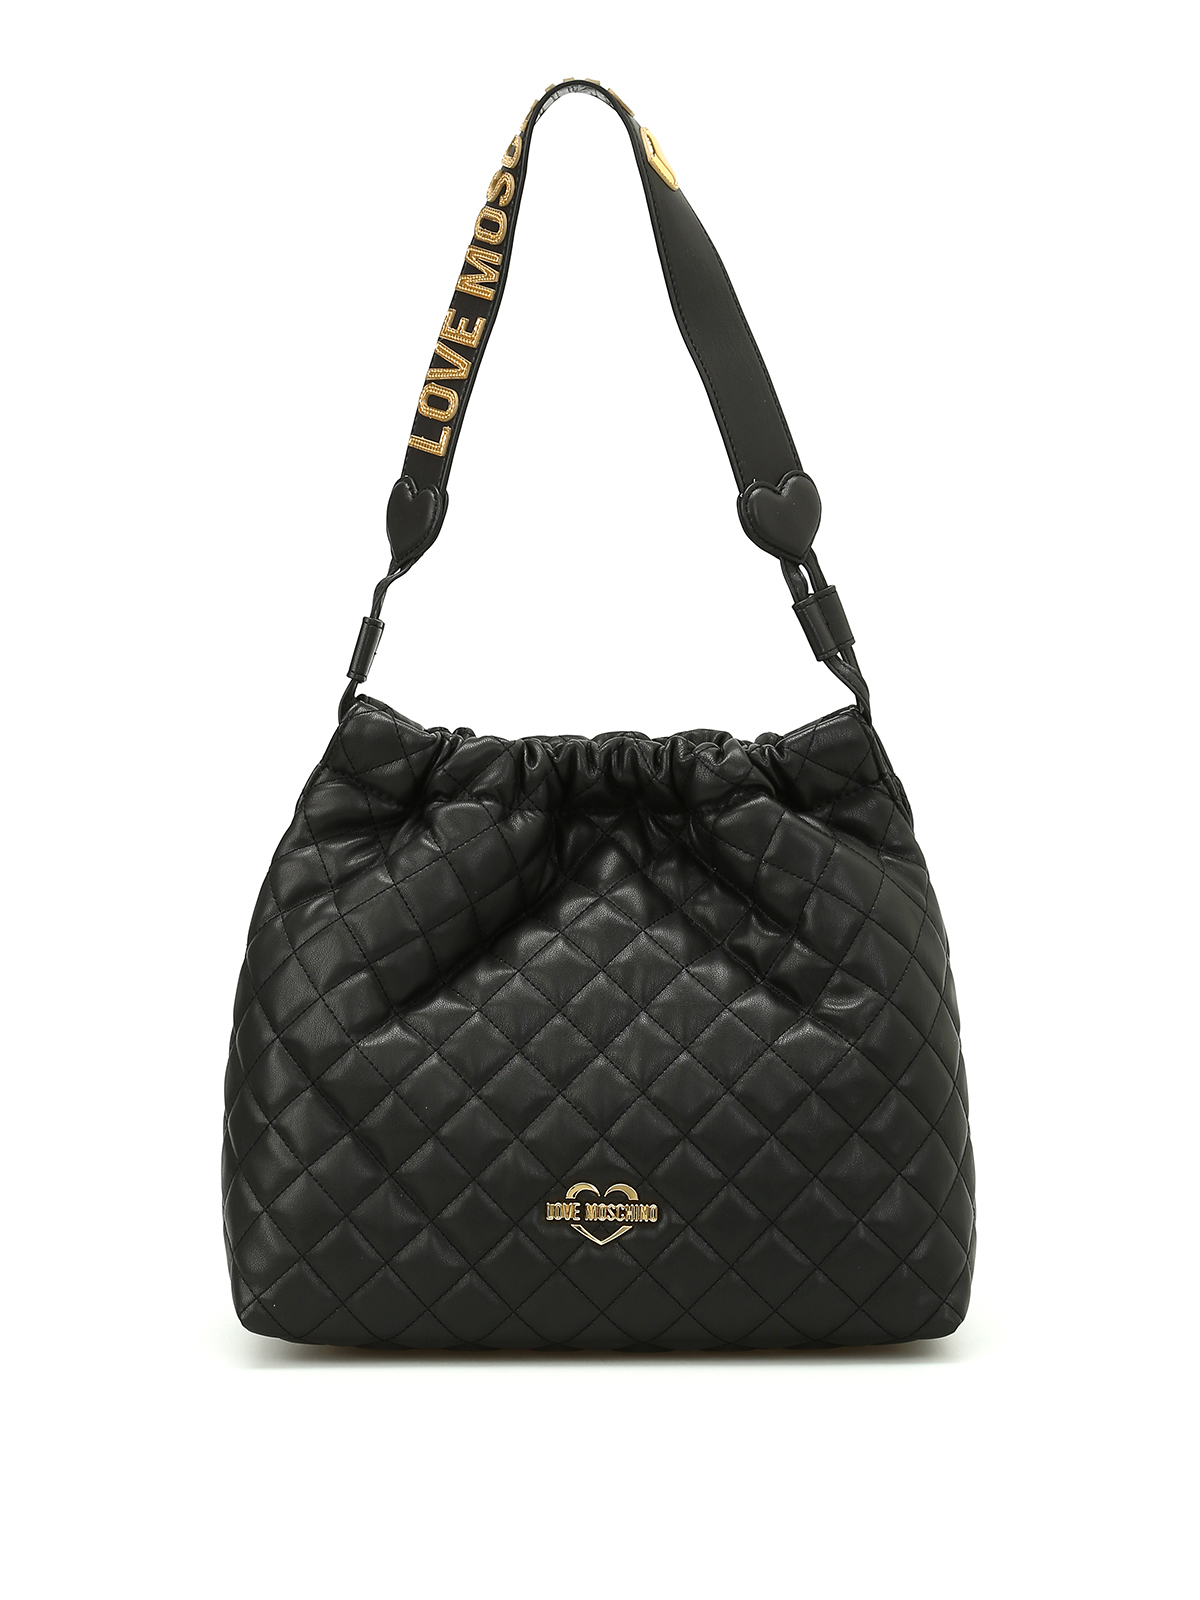 quilted nappa shoulder bag by love moschino shoulder bags ikrix. Black Bedroom Furniture Sets. Home Design Ideas